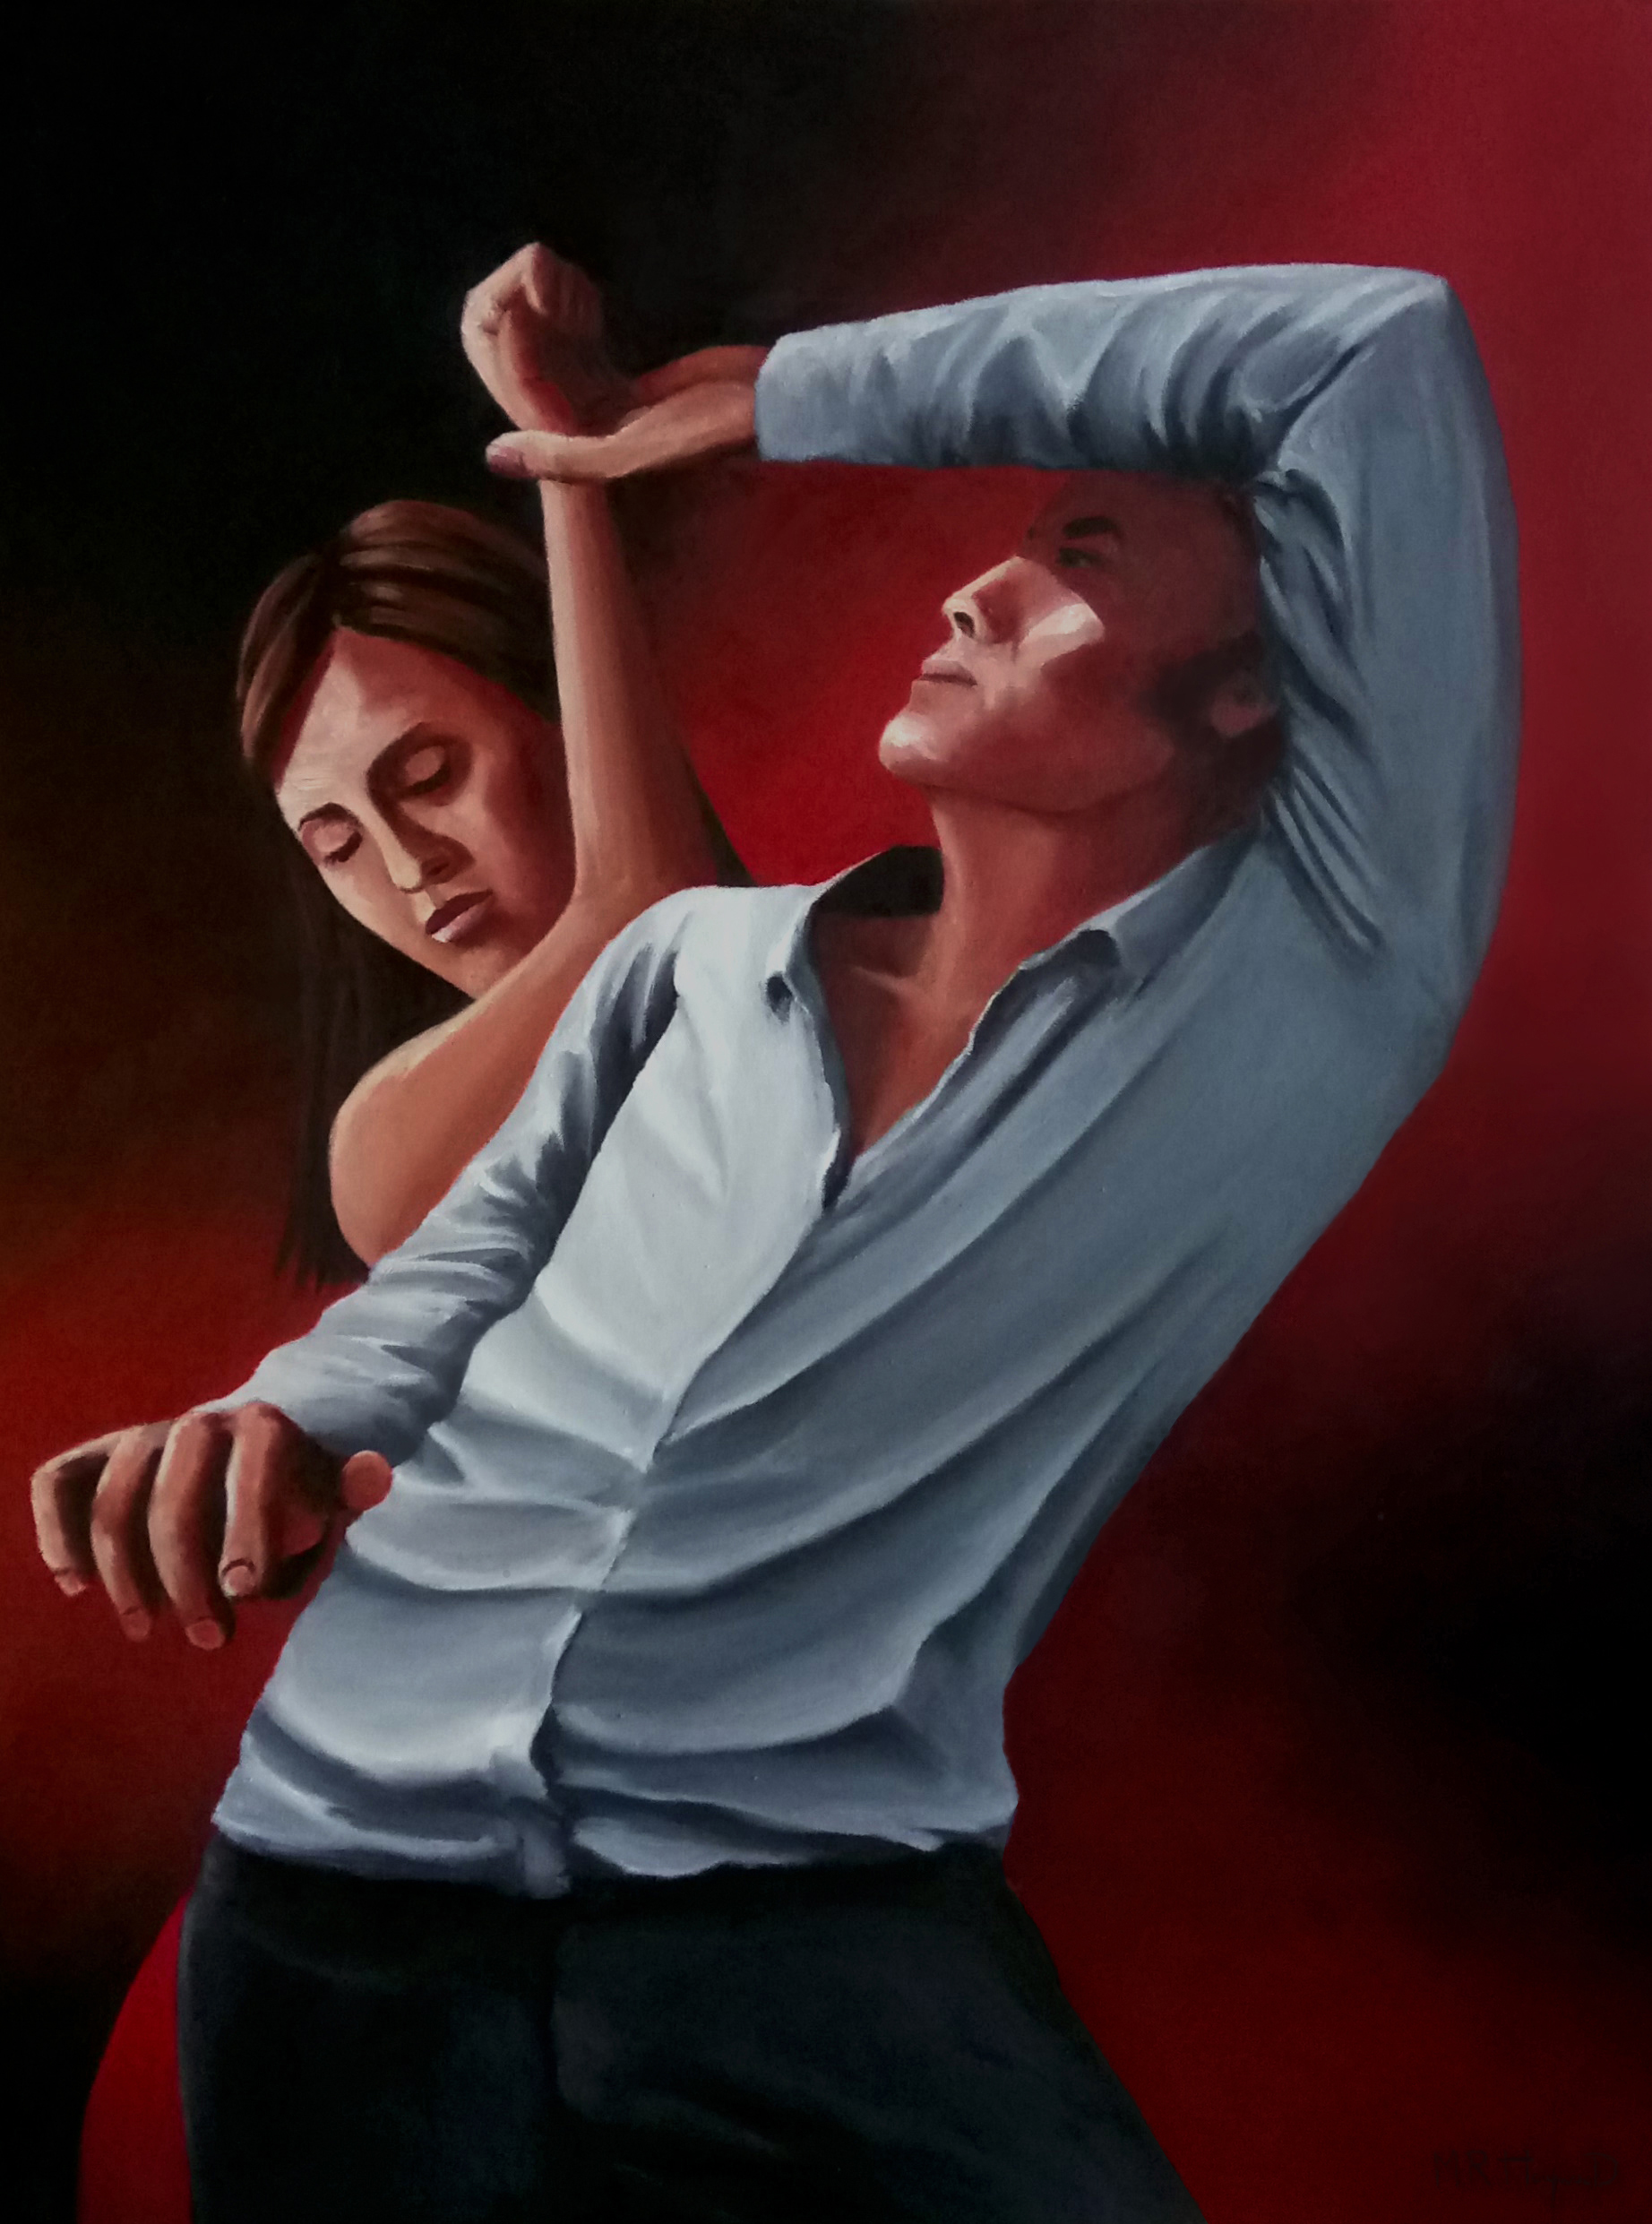 Rhythm artwork by Mark Robert Haywood - art listed for sale on Artplode